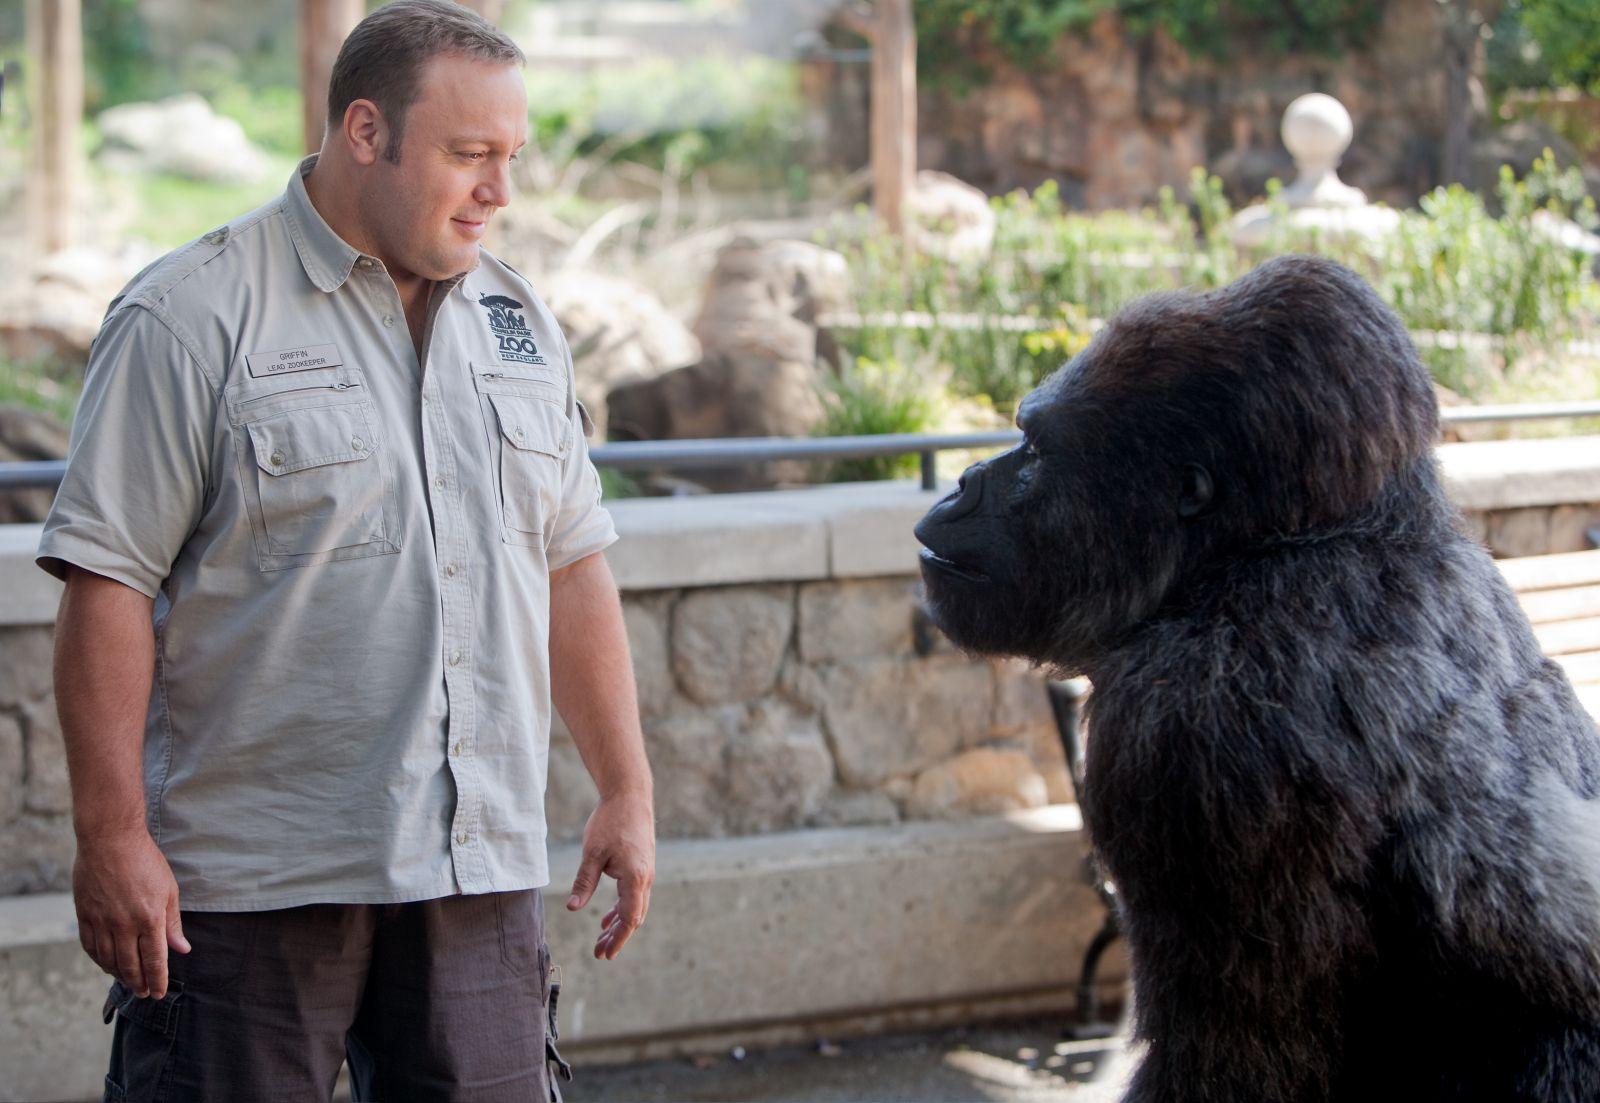 Zookeeper movie